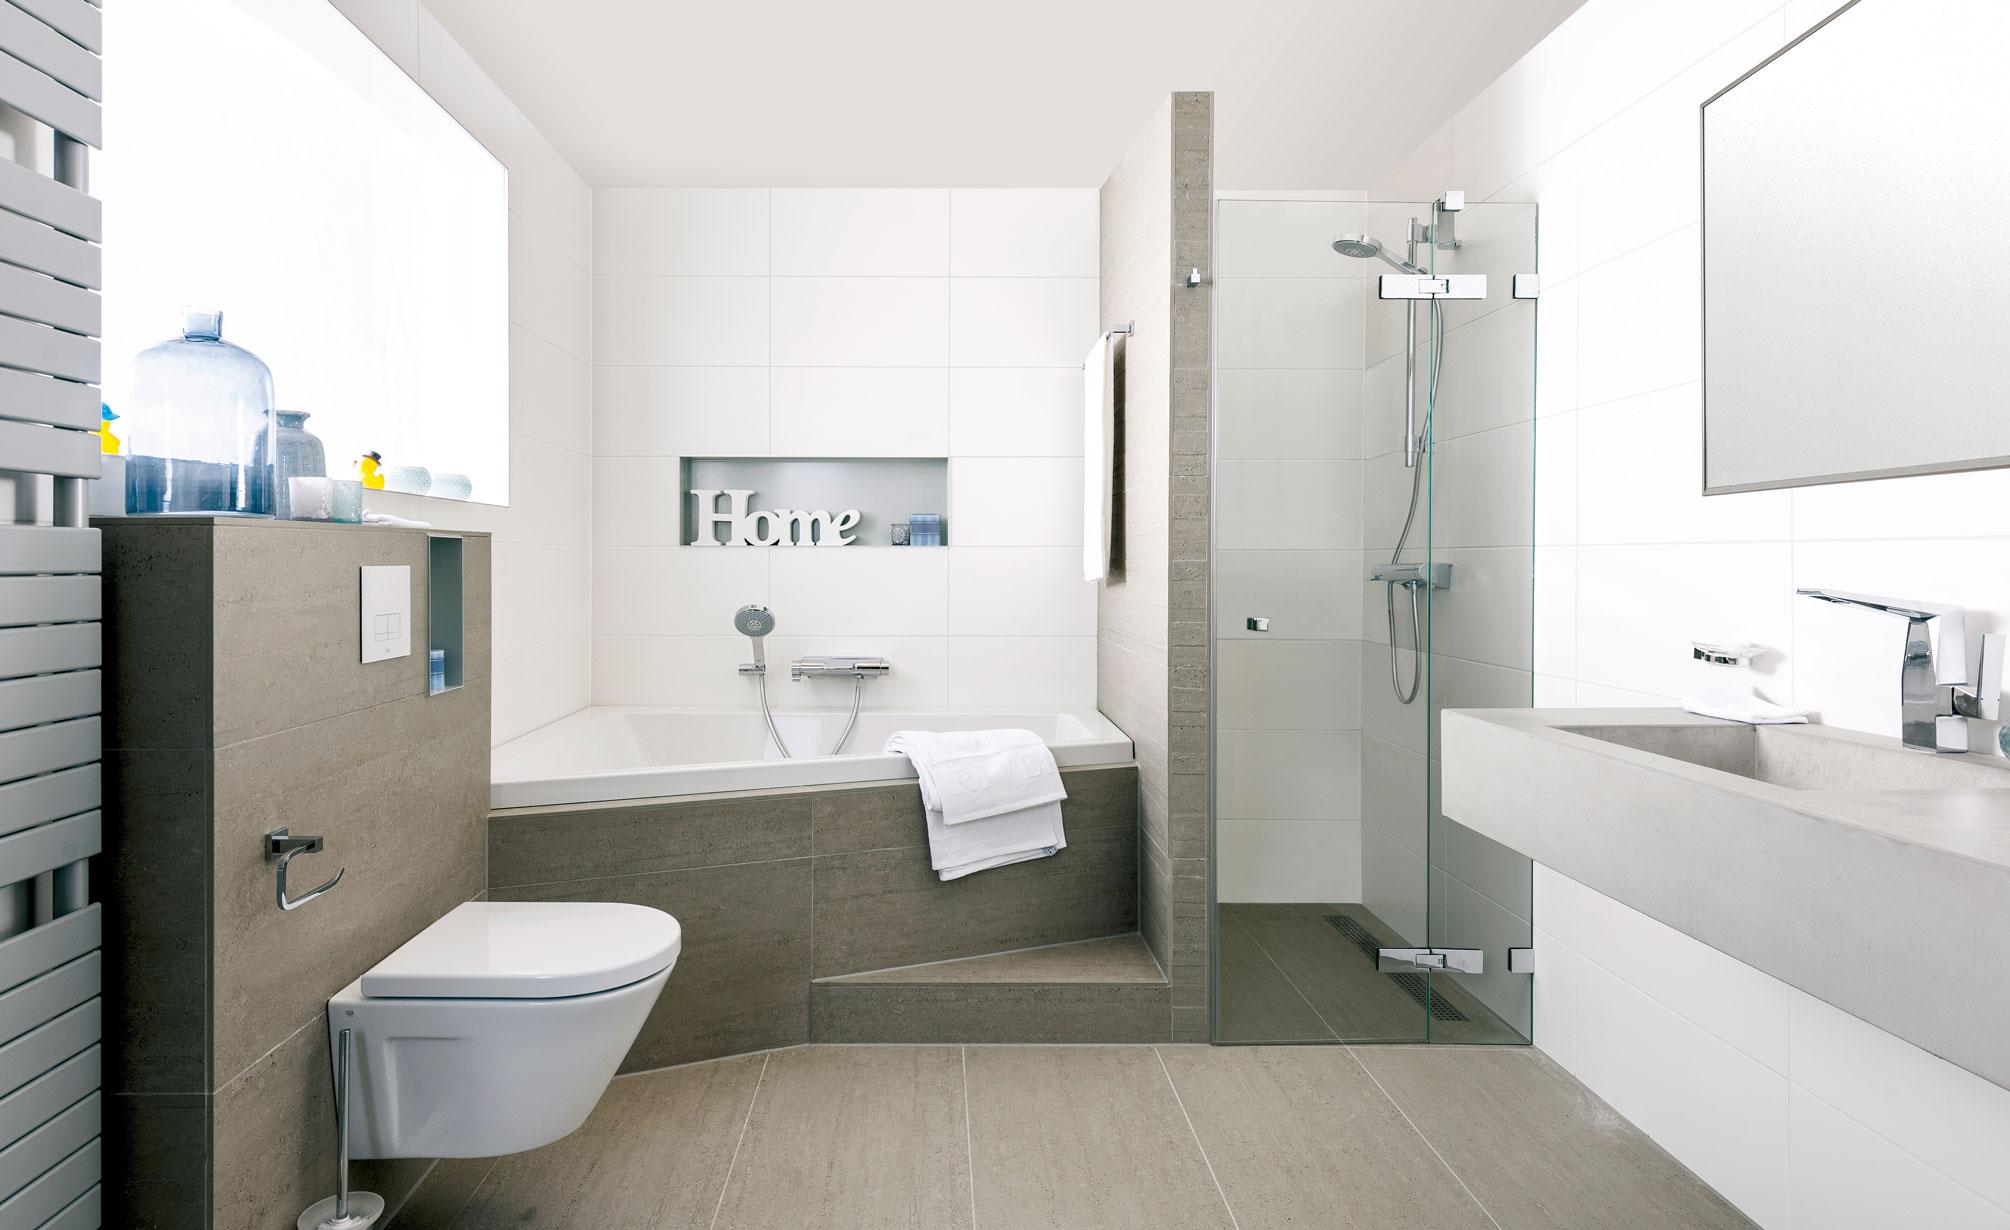 Wedstrijdje badkamer opknappen in n dag - Sanitair opknappen ...